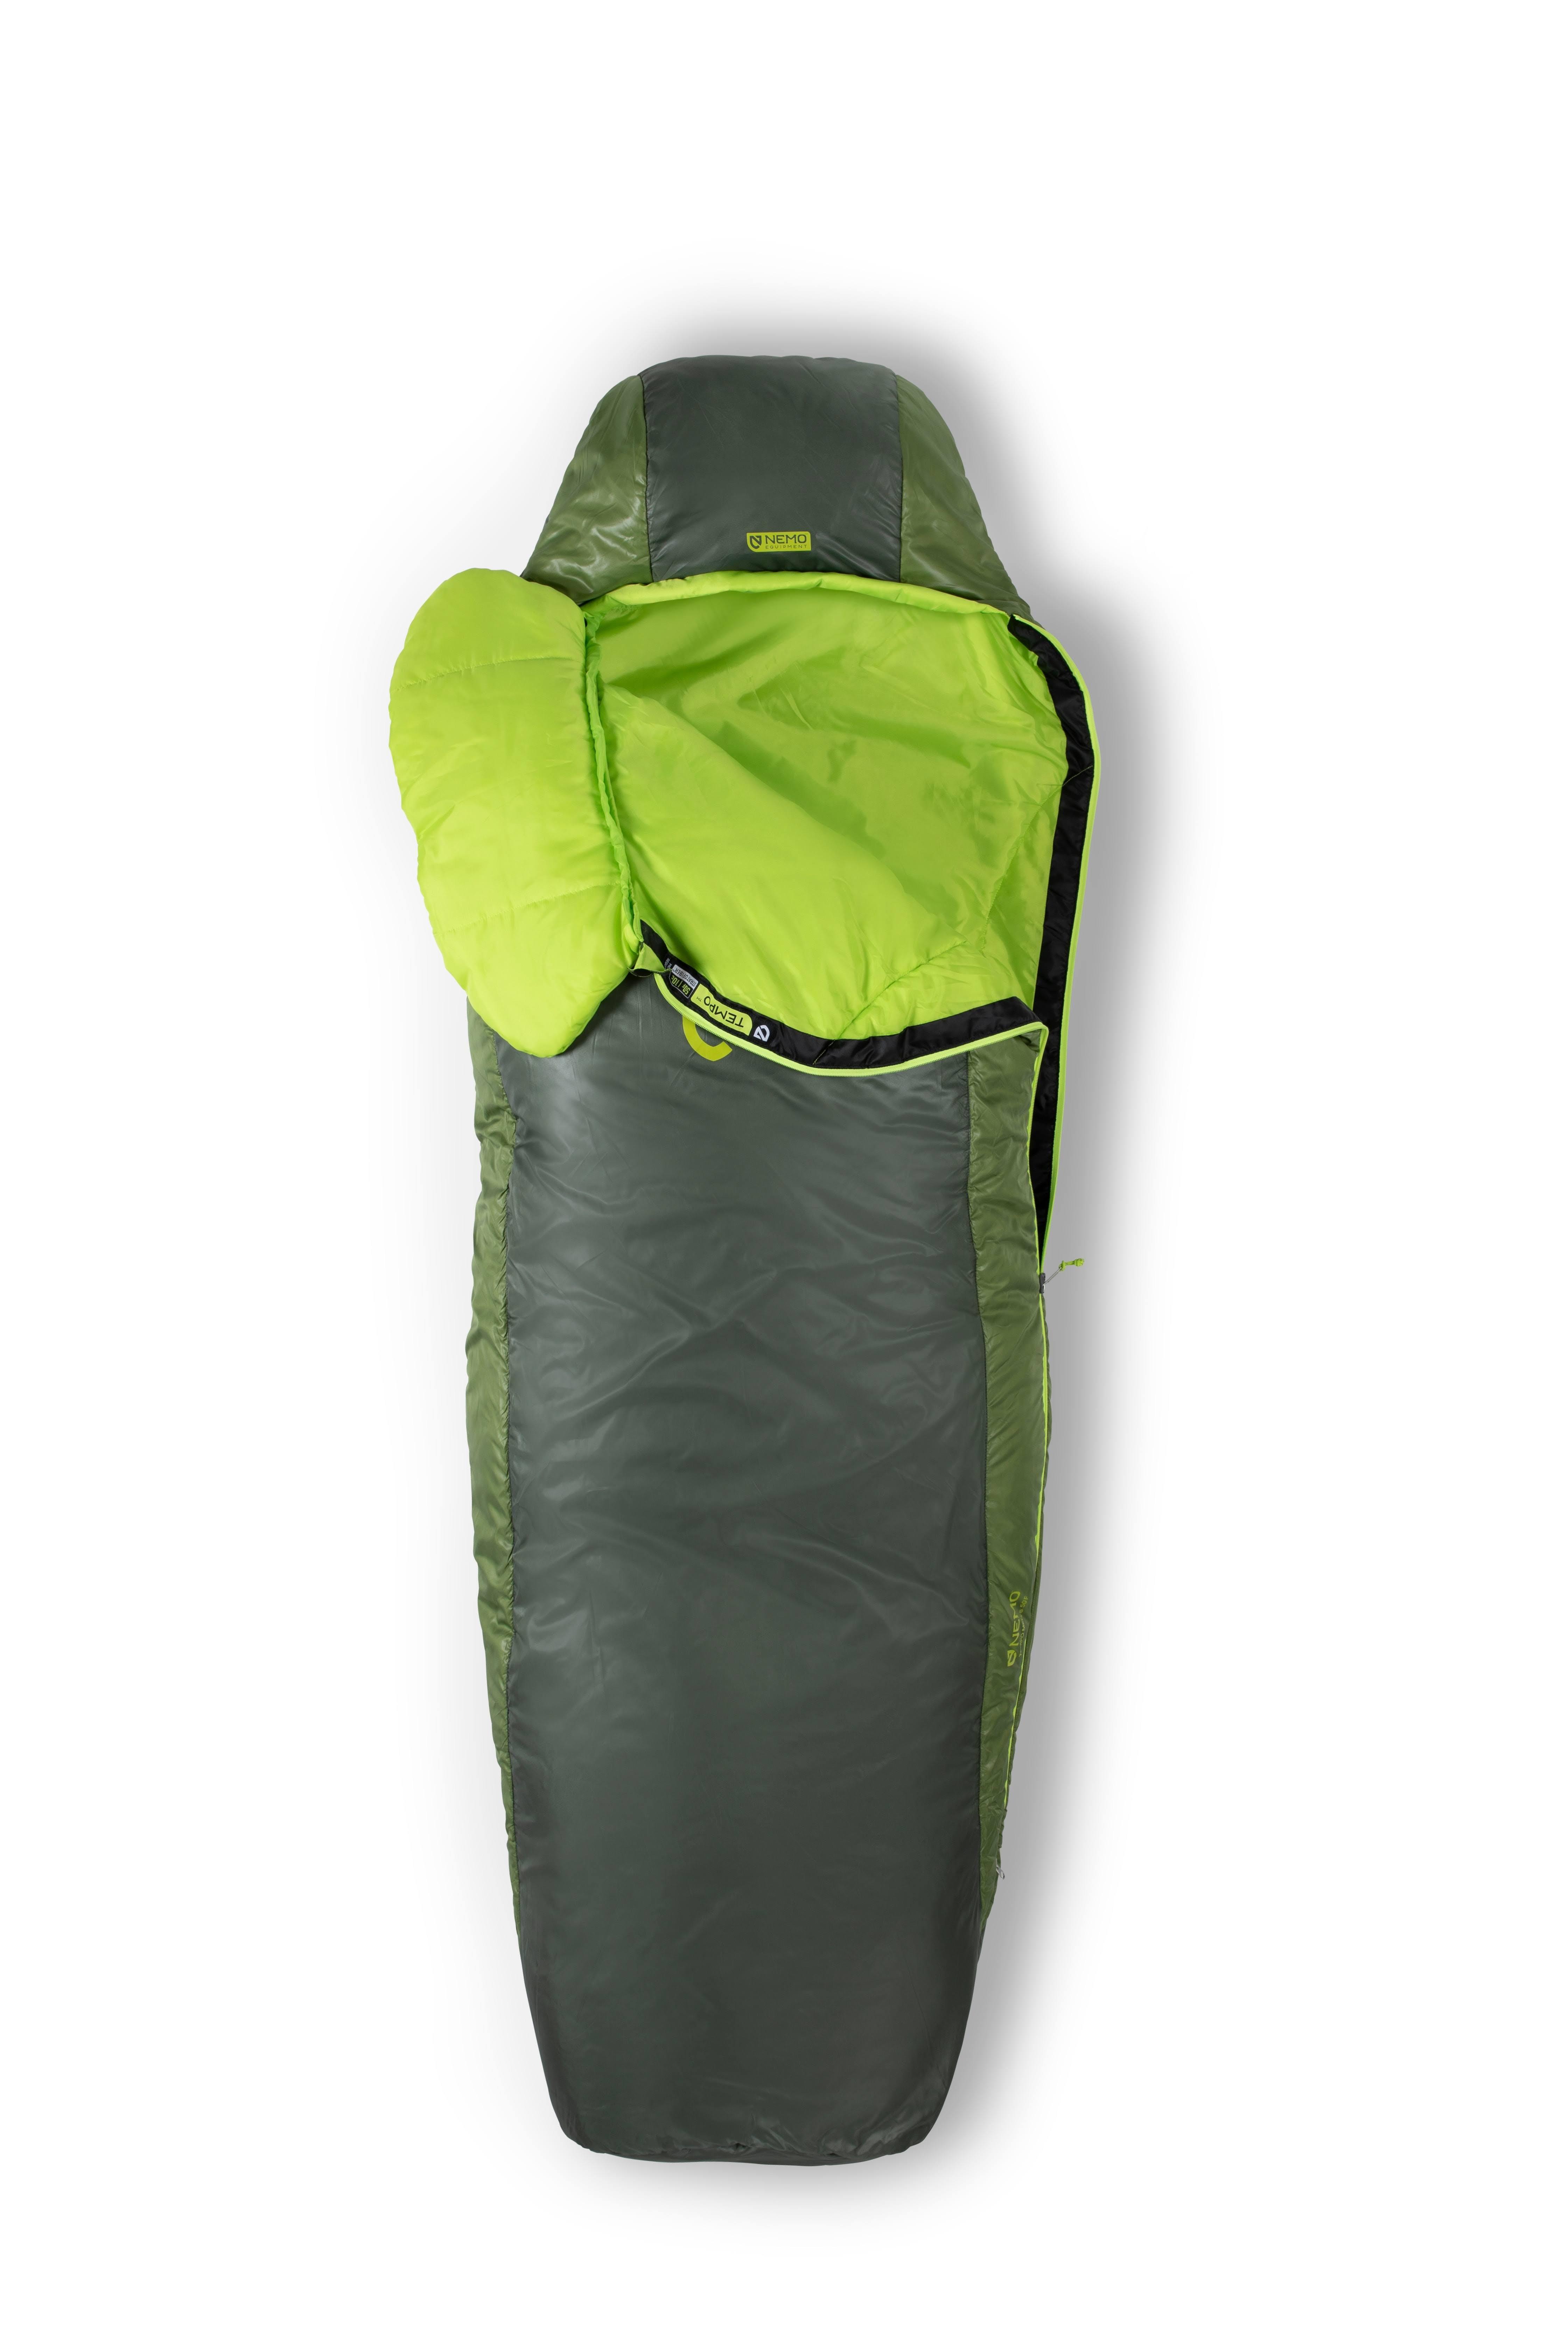 Nemo Men's Tempo 35 Sleeping Bag - Sapling/Dark Timber - Long